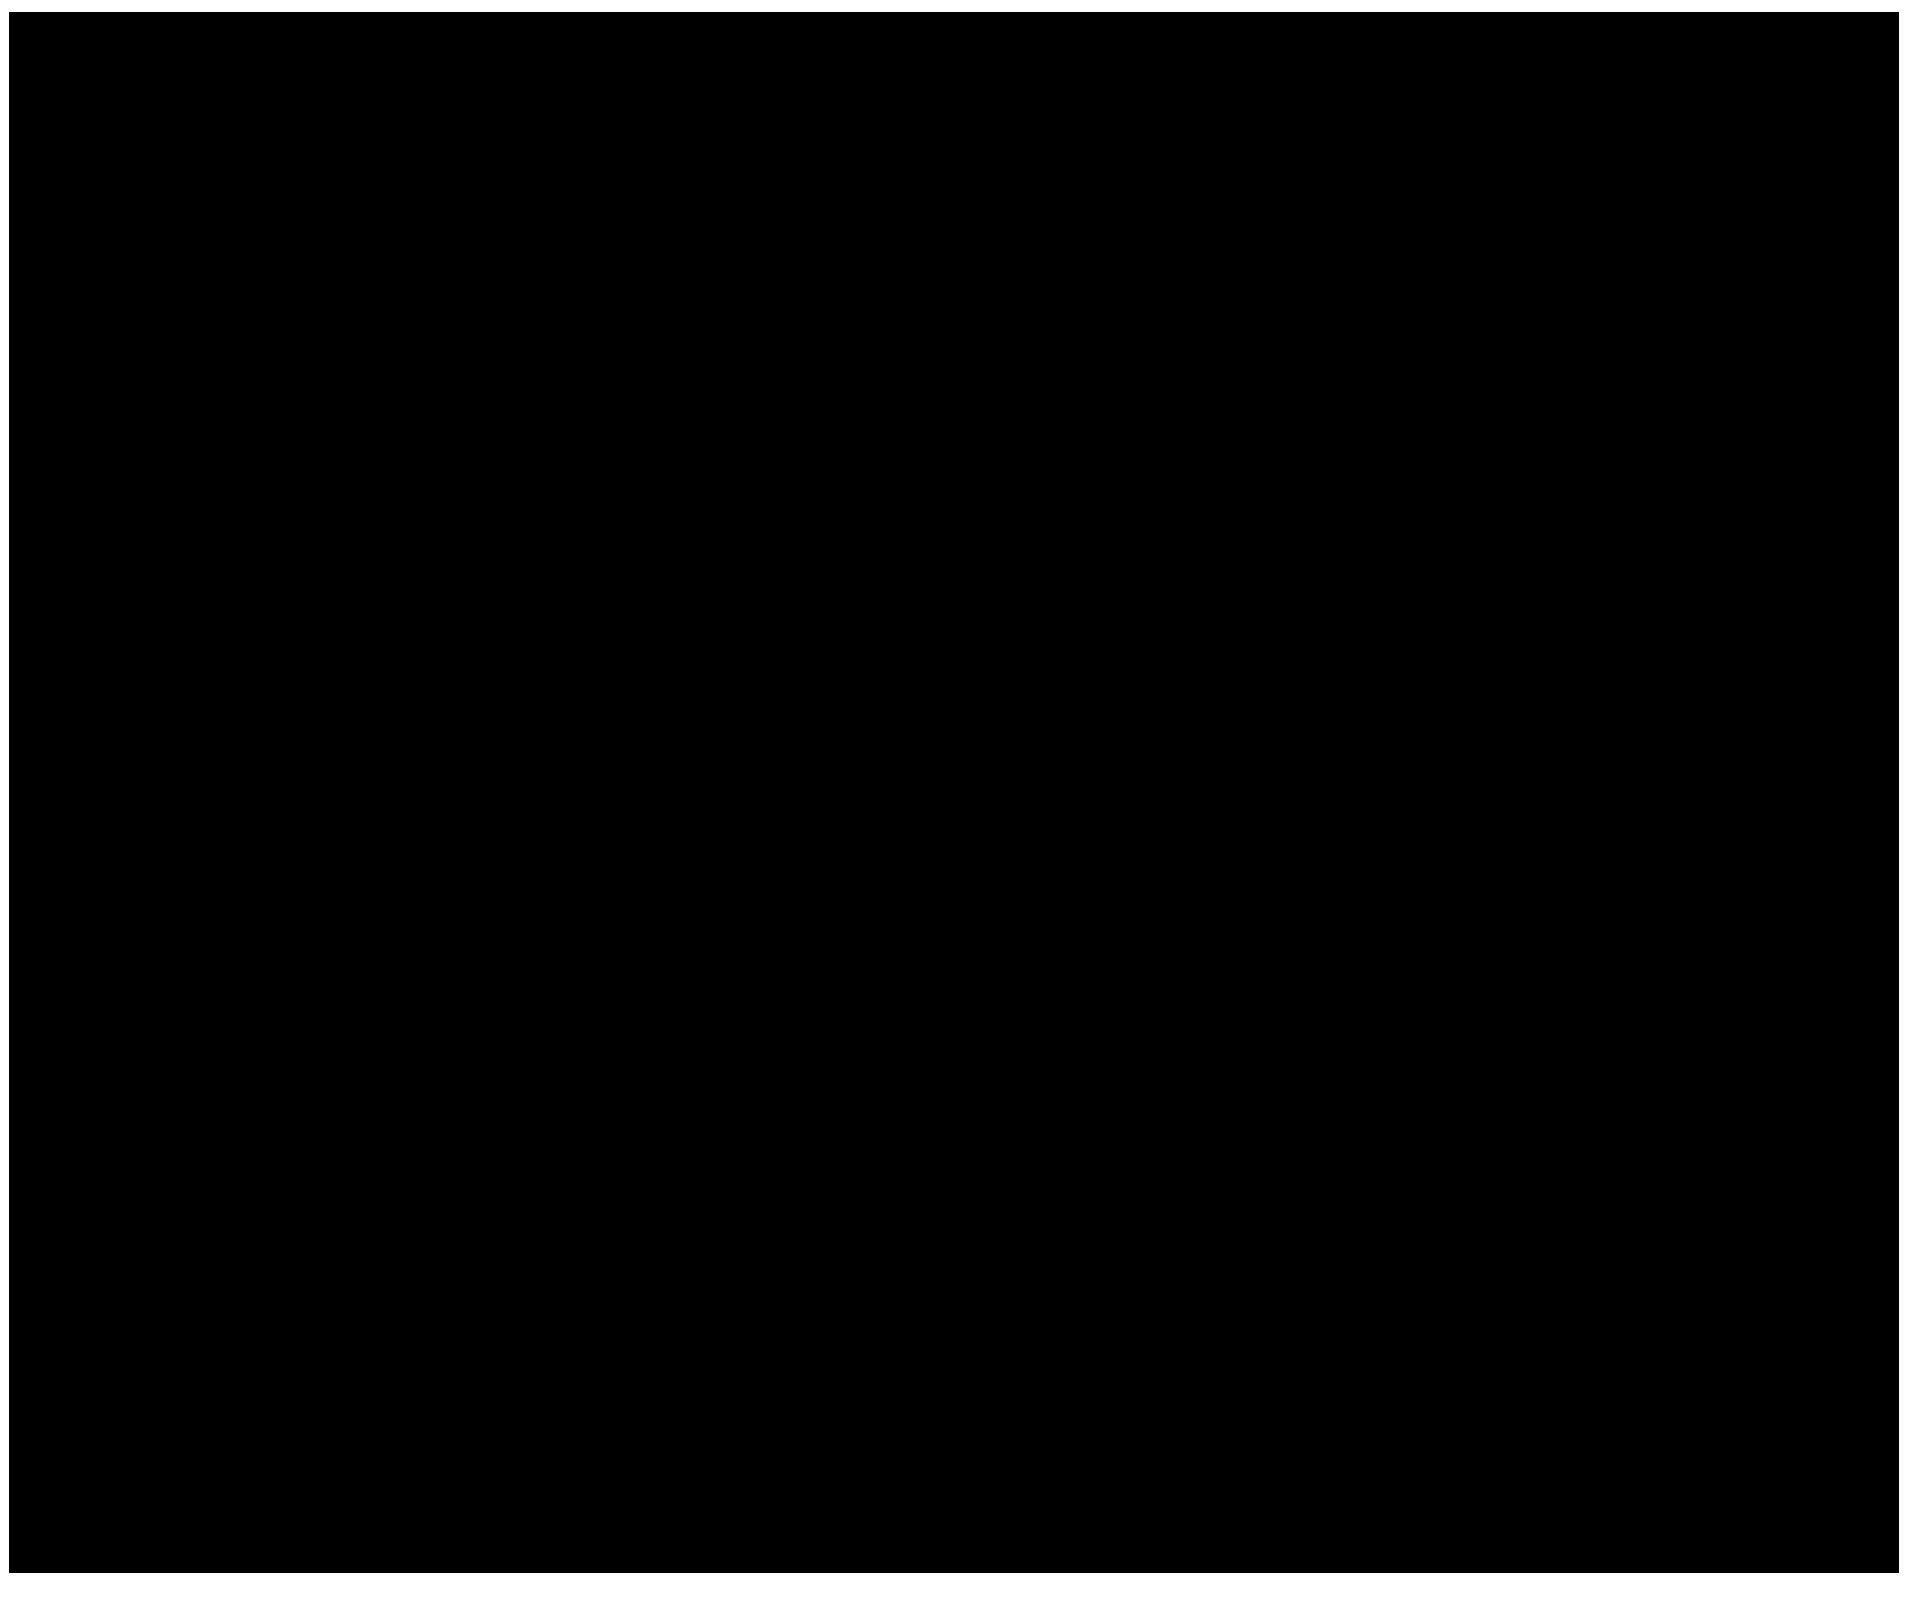 rome mural colab logo